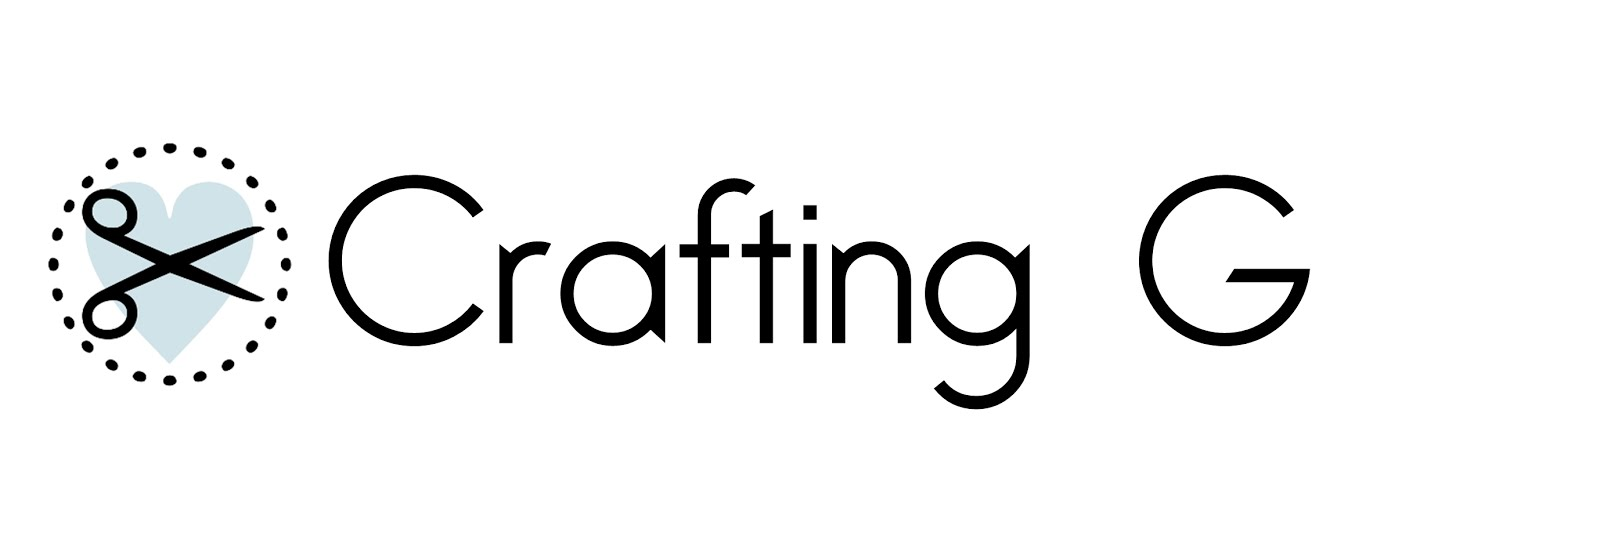 Crafting G